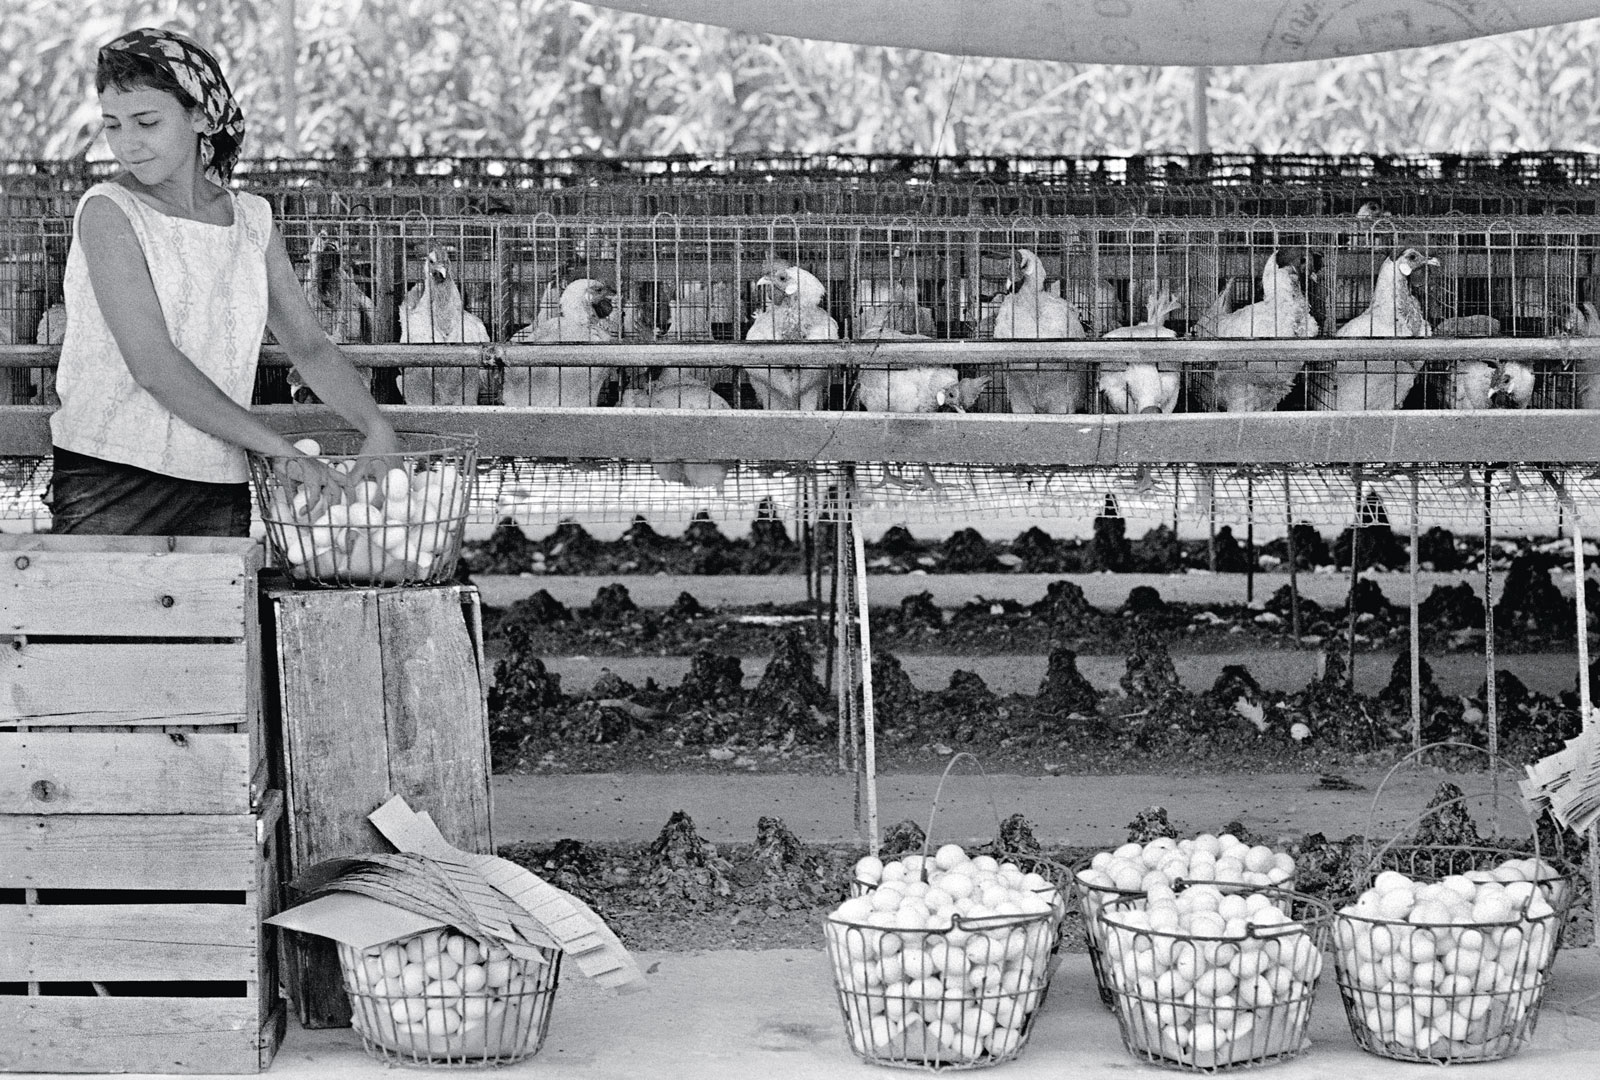 lockwood-chickens